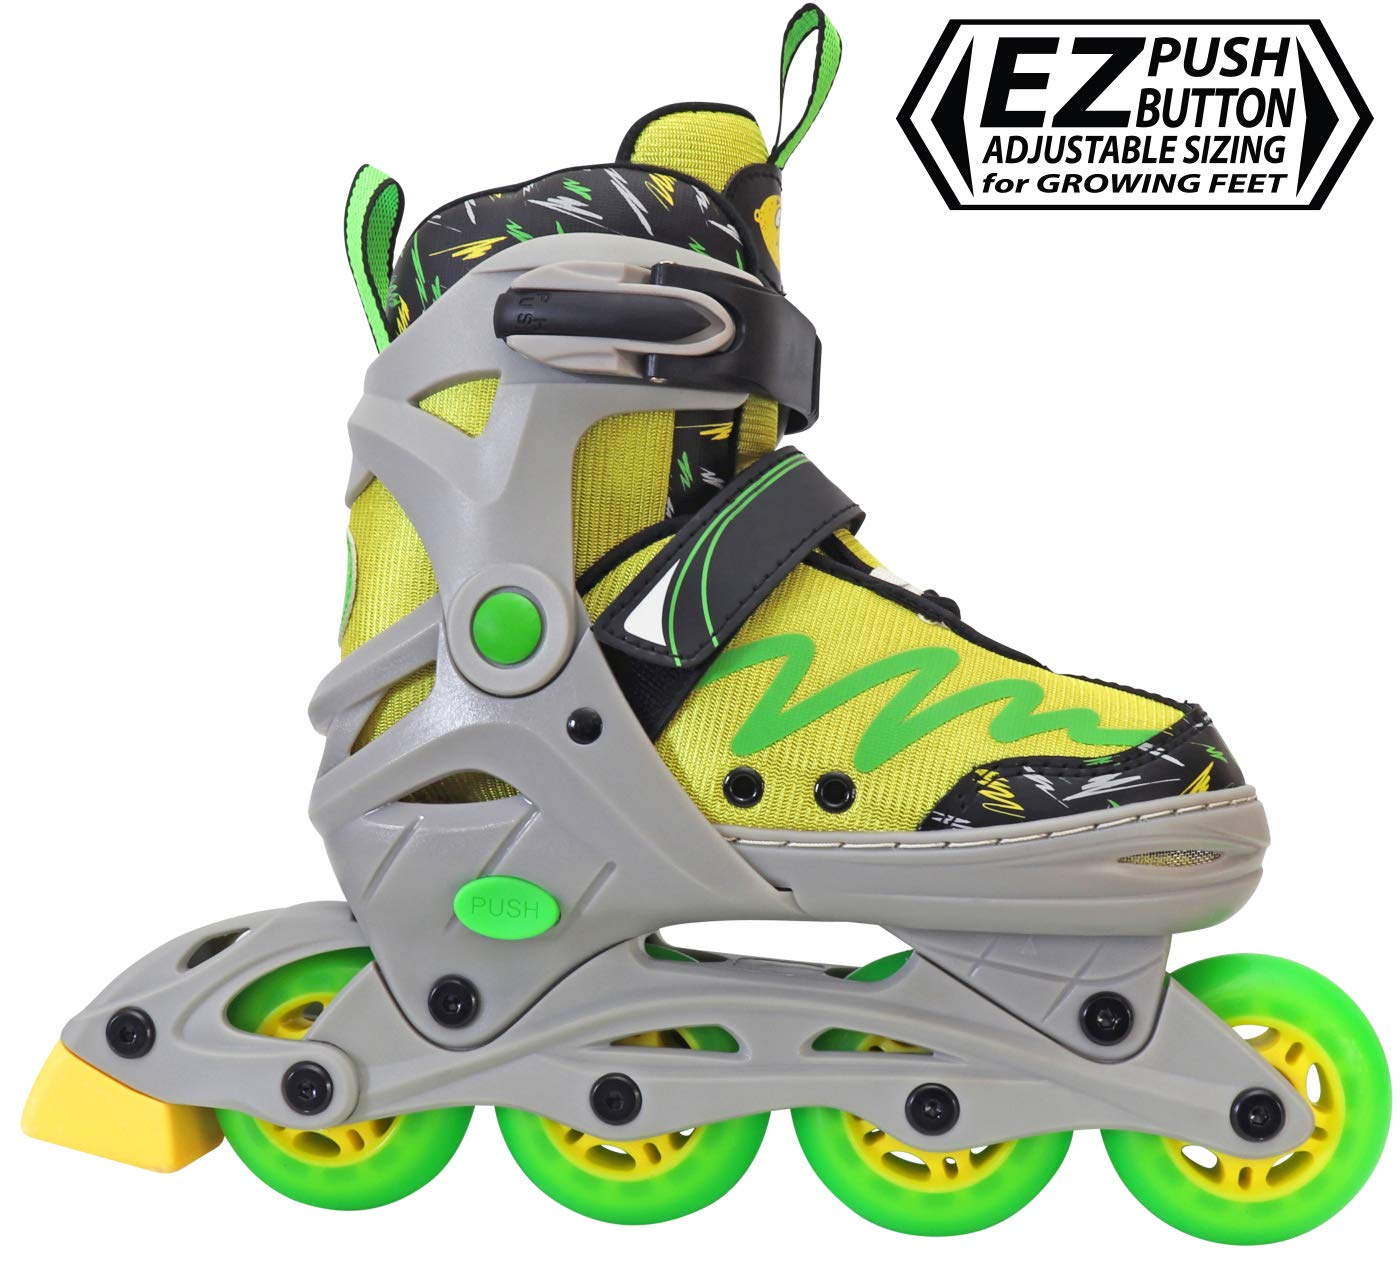 Lenexa Lemon Twist Adjustable Inline Skates Kids Rollerblades Boys - Roller Blades for Youth - rollerskates for Kid, Boy, Girl, Girls - Comfortable fit - Safety Non-Slip Wheels (Green/Yellow)